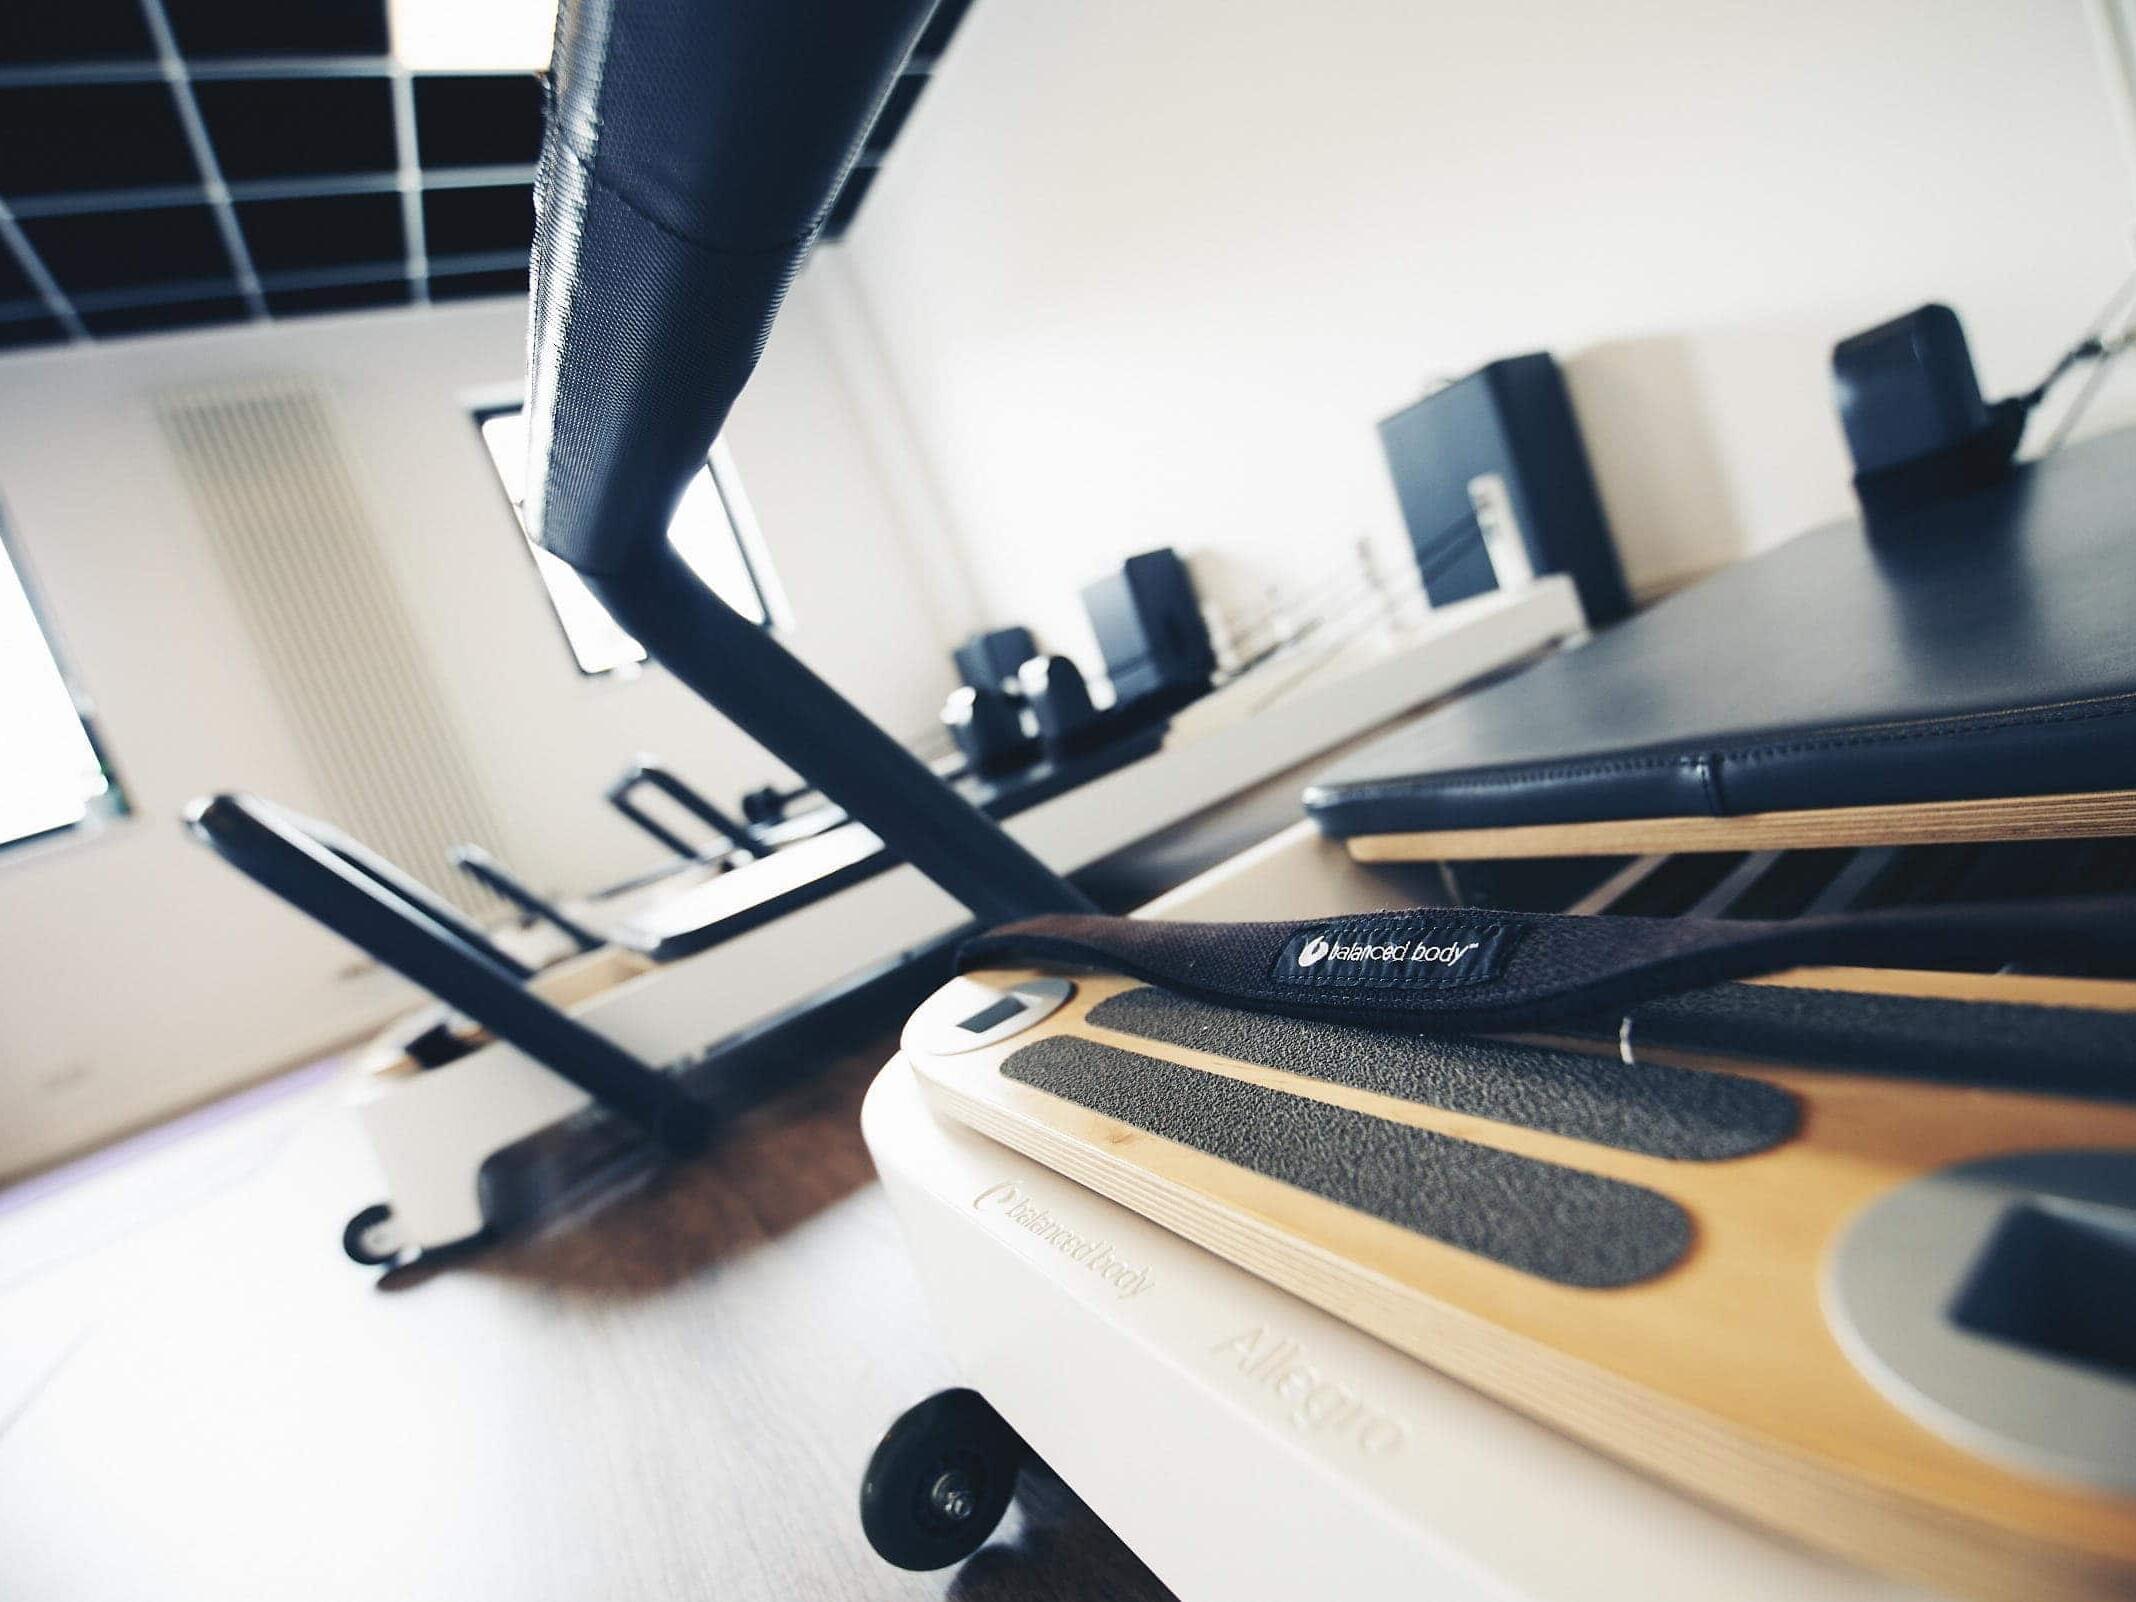 Fotografie von Pilates Trainingsgeräten